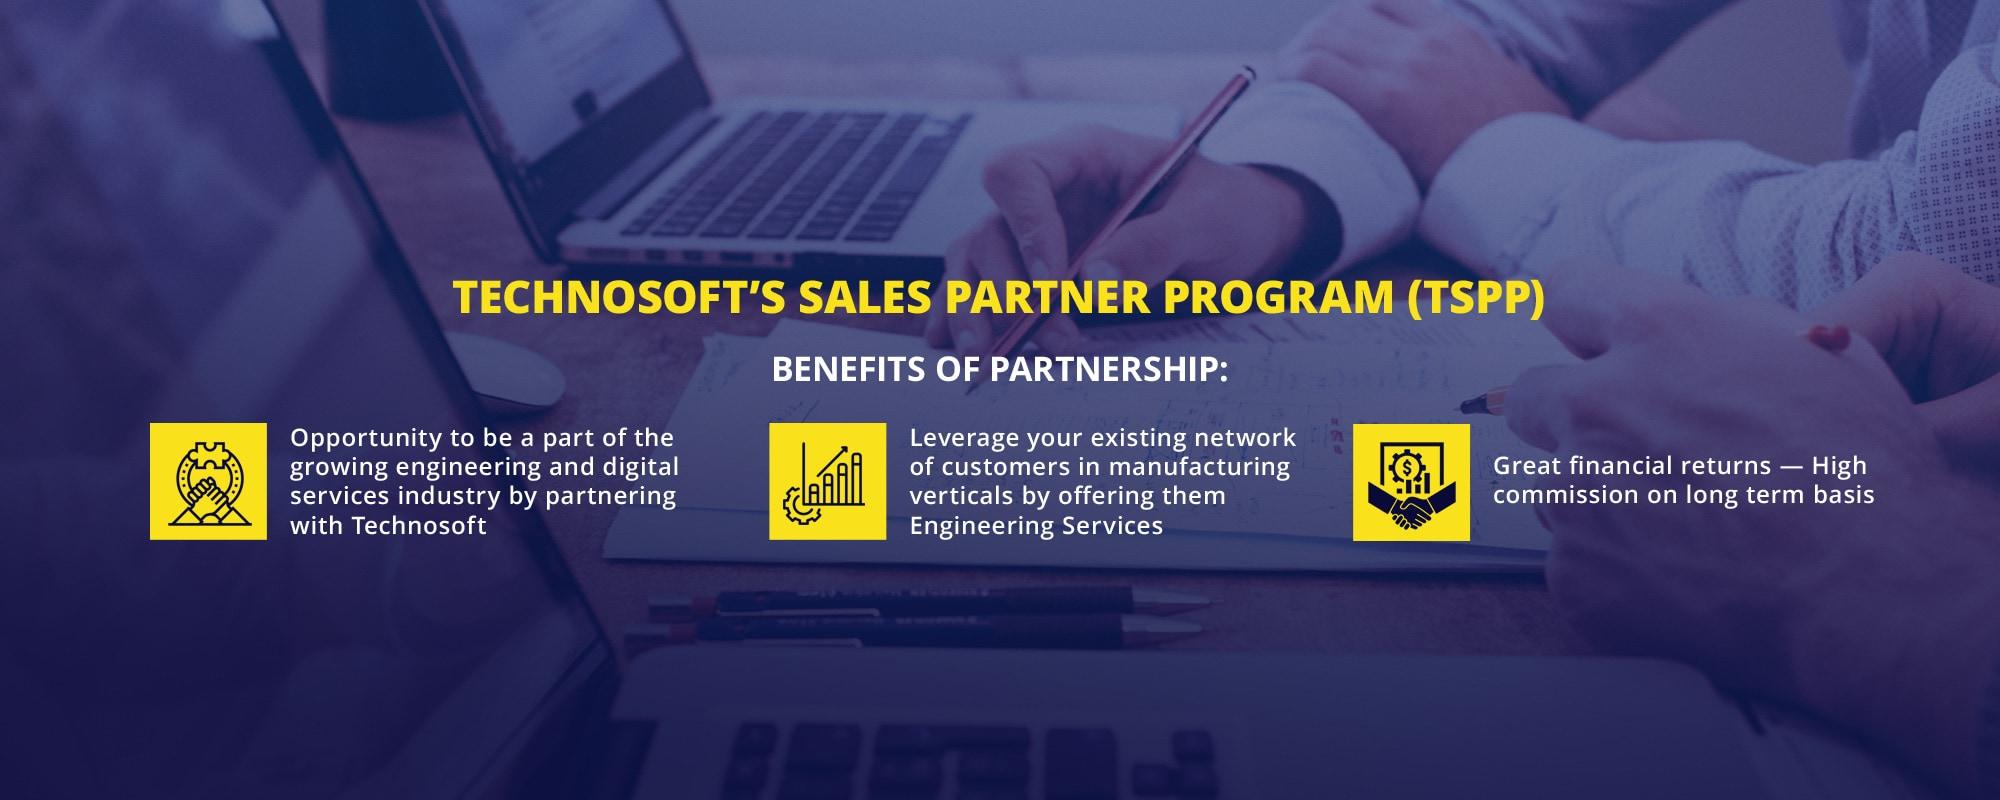 Technosoft's Sales Partner Program (TSPP)